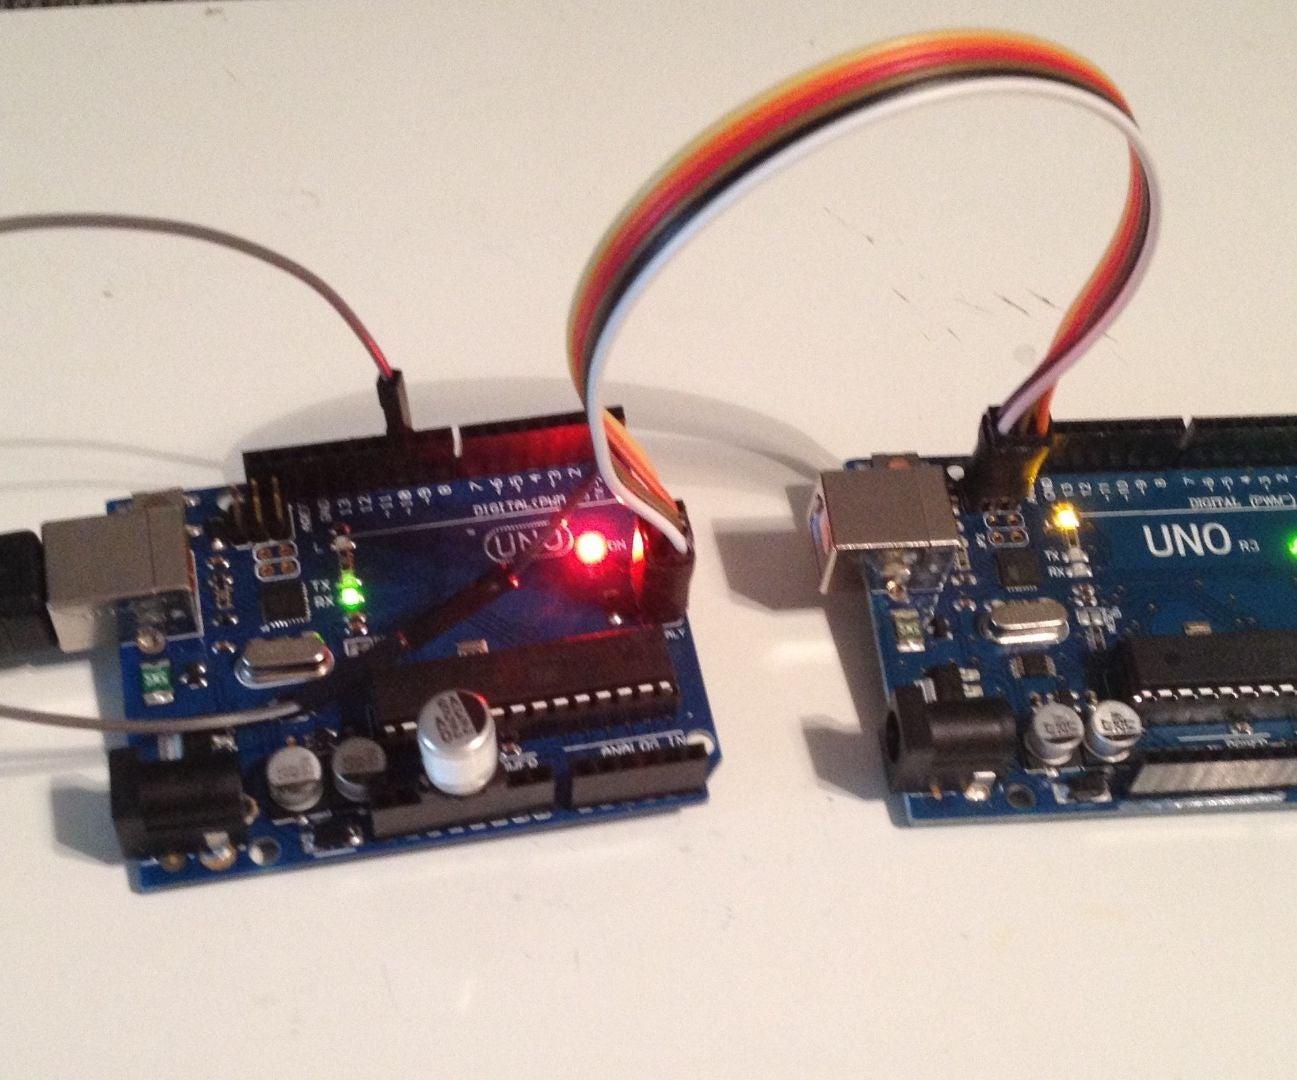 How To Restore The Arduino Uno R3 Atmega16u2 Firmware Using Usbasp Usb Programmer For Atmel Avr Controllers Nexuscyber Ide 4 Steps